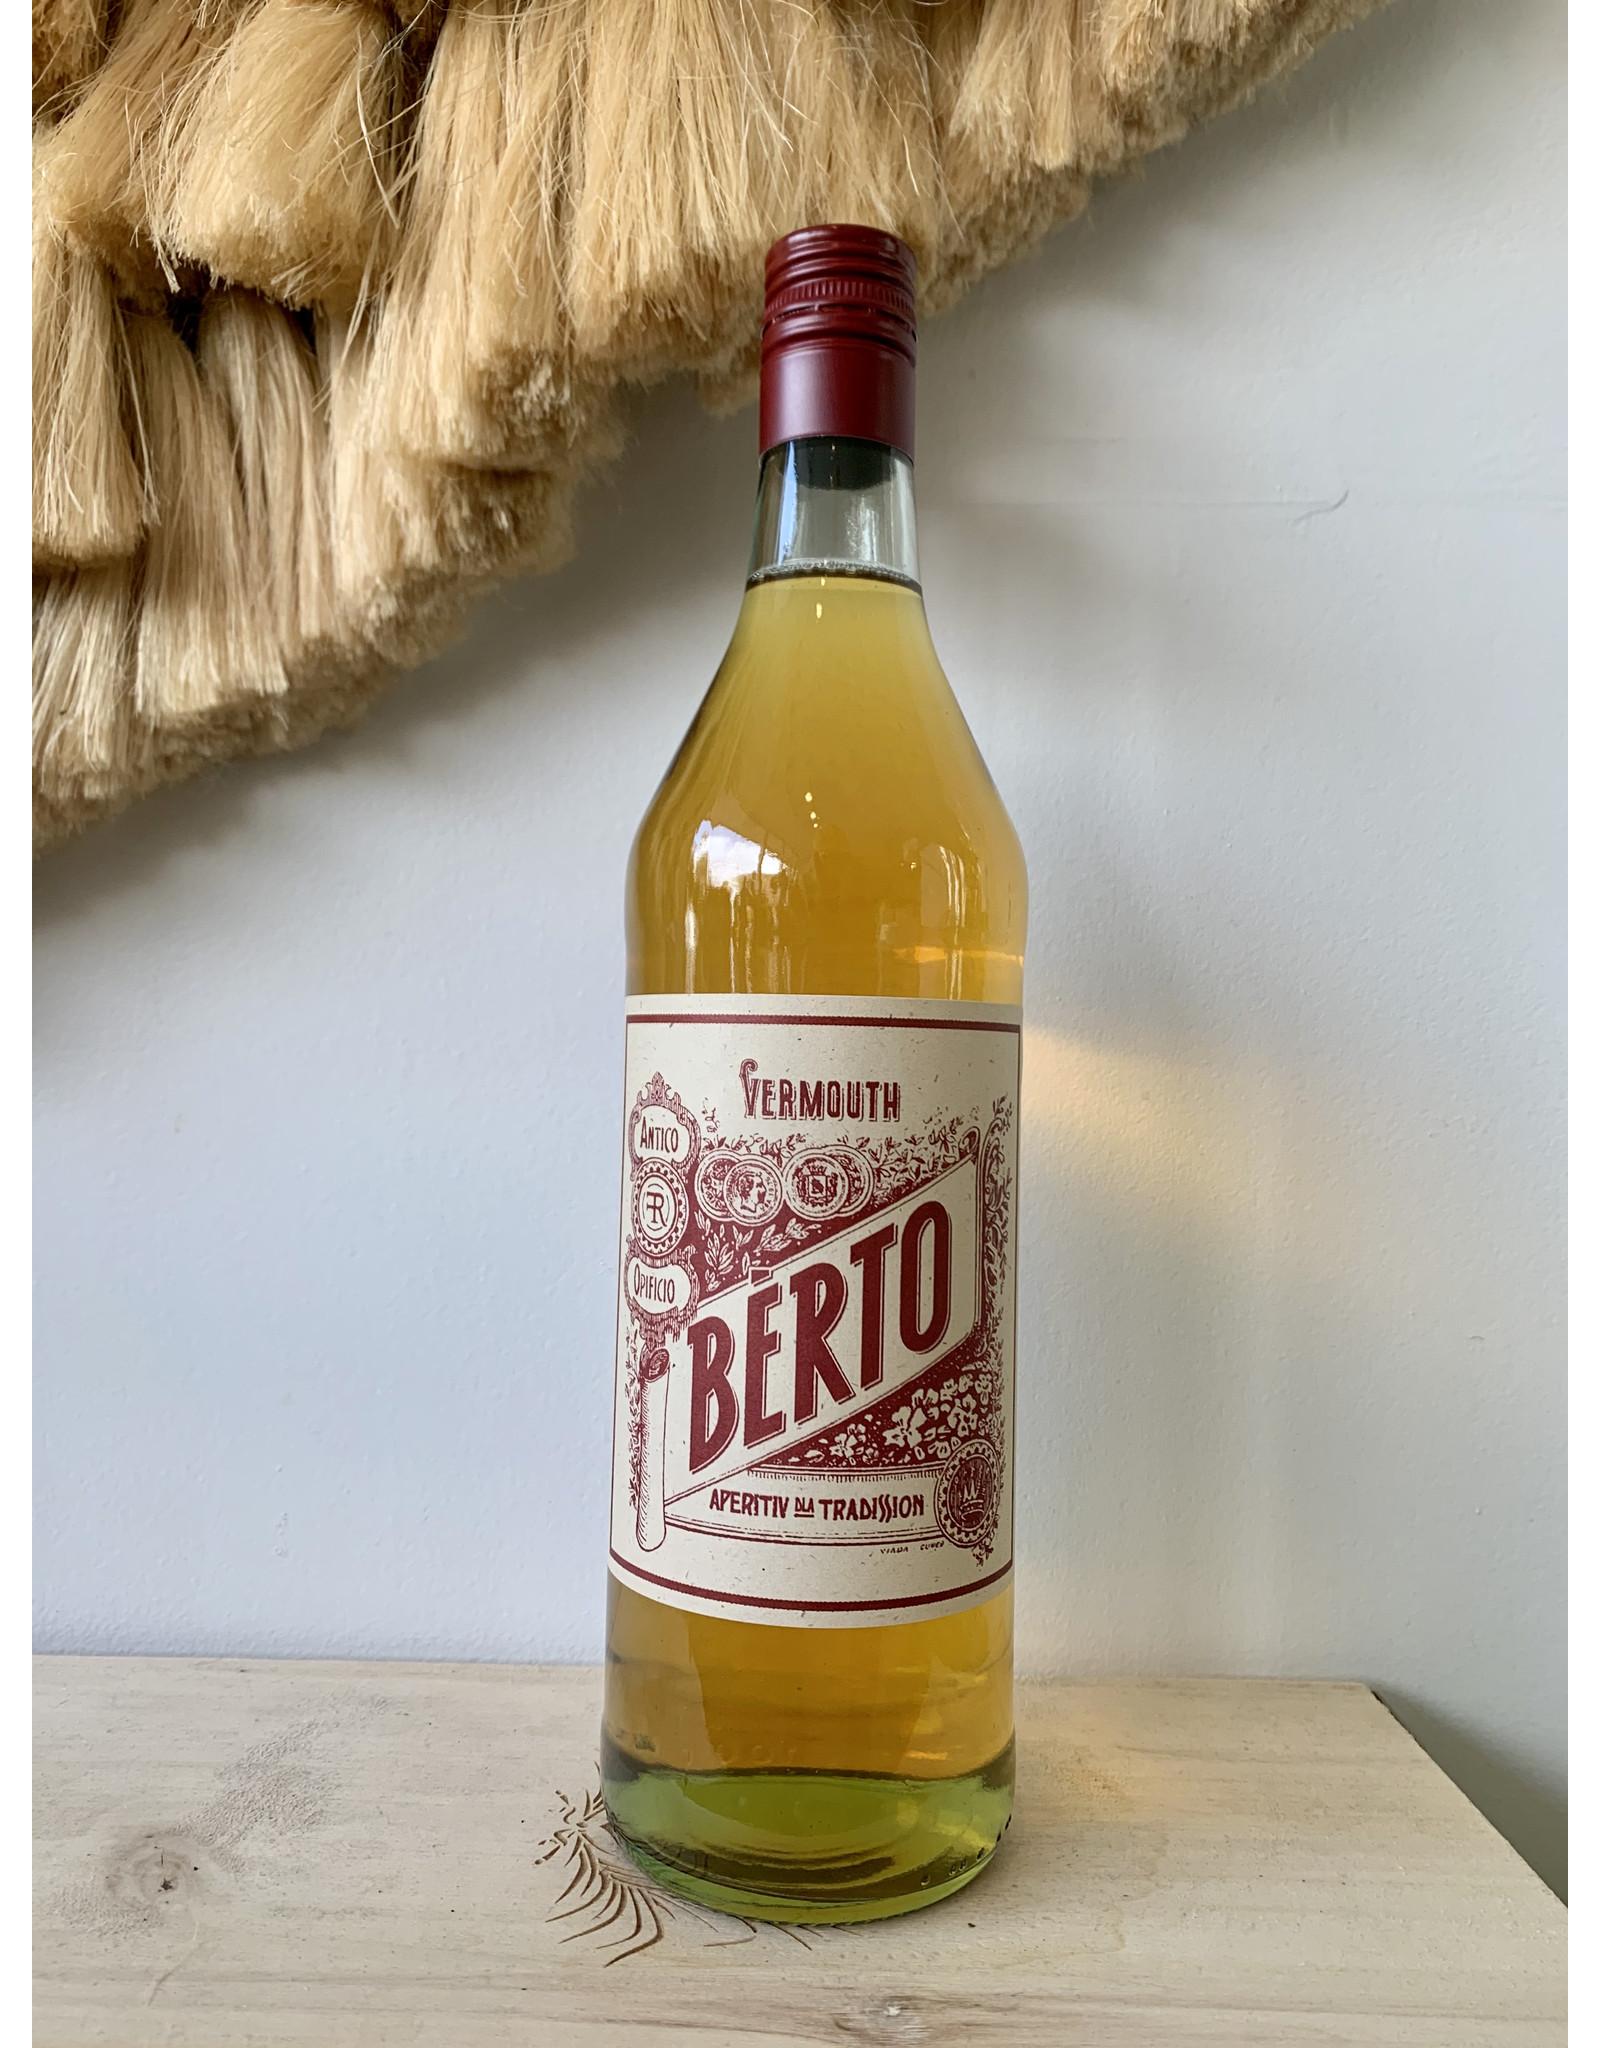 Bèrto Vermouth Aperitiv Dla Tradission Bianco (NV) 1L